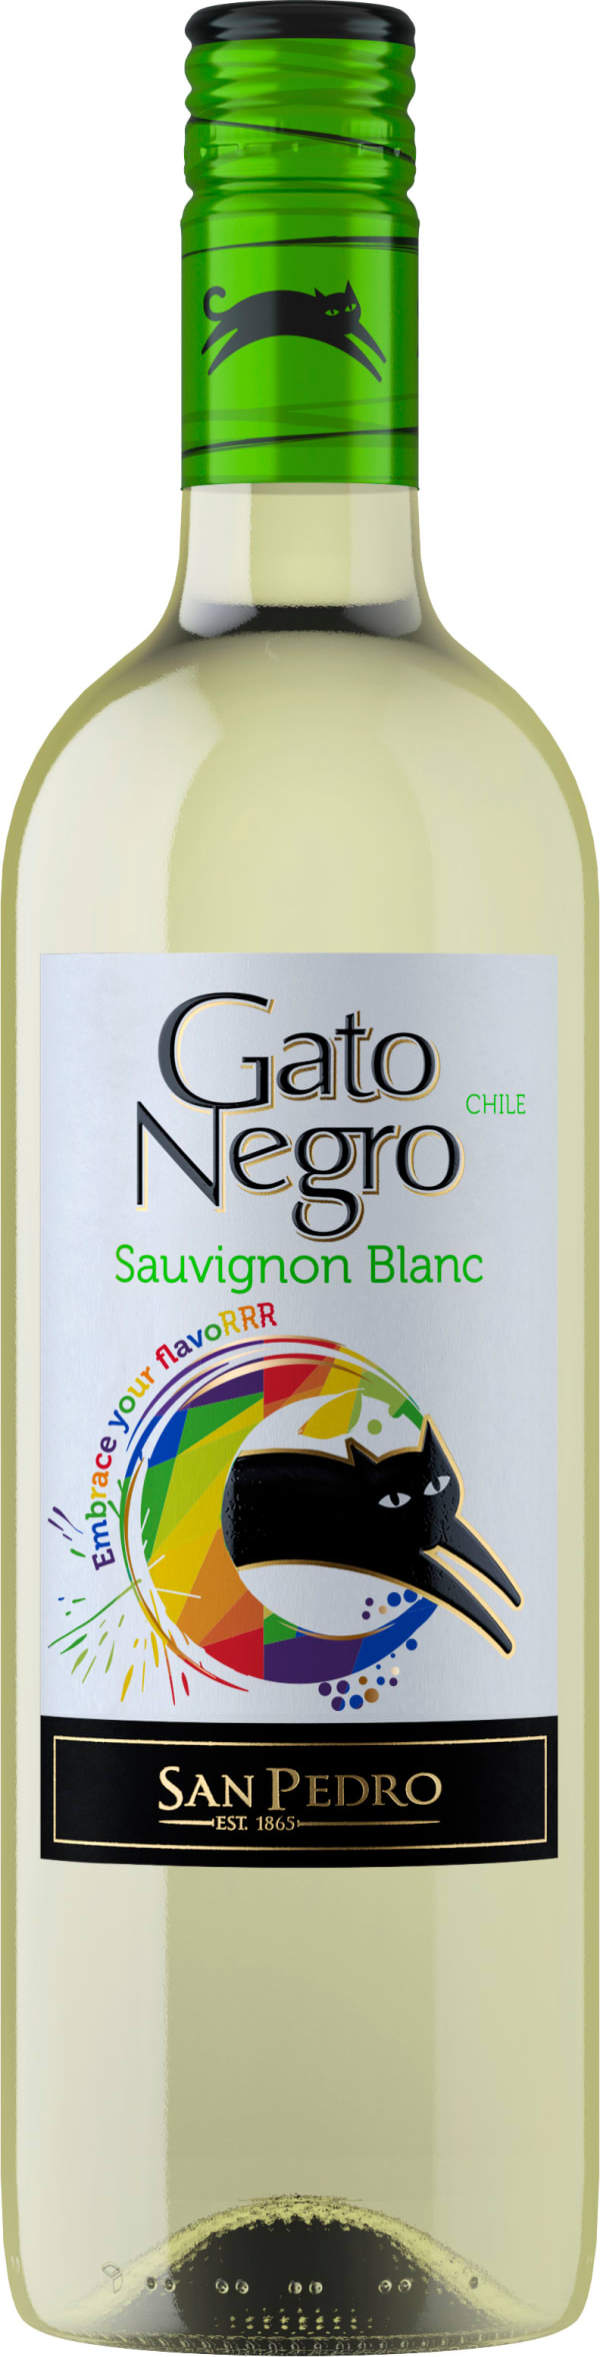 Gato Negro Sauvignon Blanc 2018